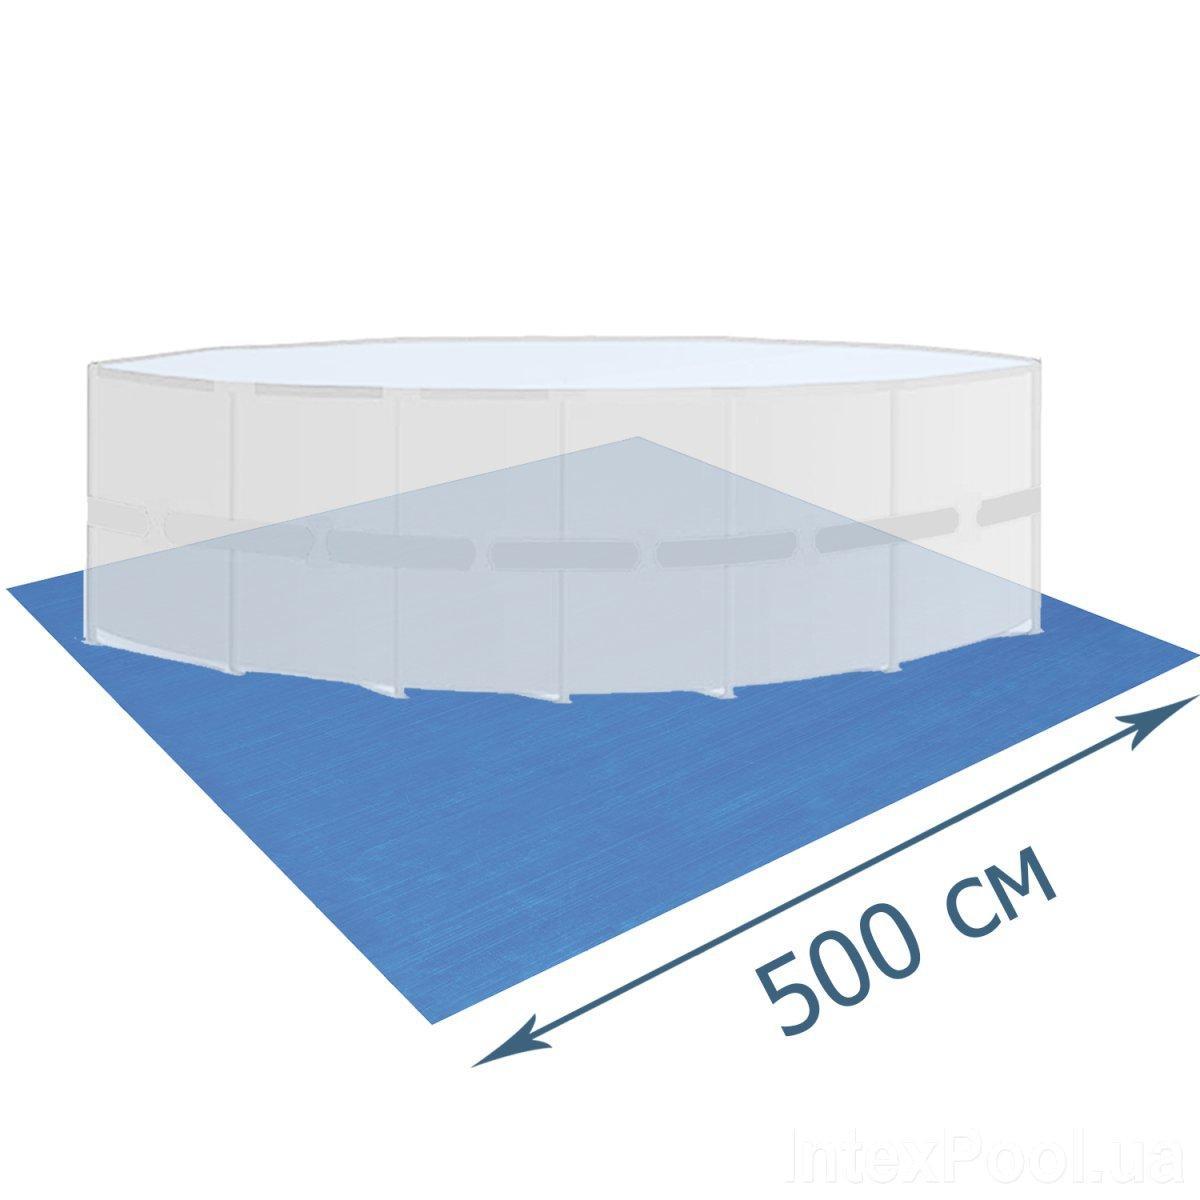 Подстилка для бассейна IntexPool 55009, 500 х 500, квадратная